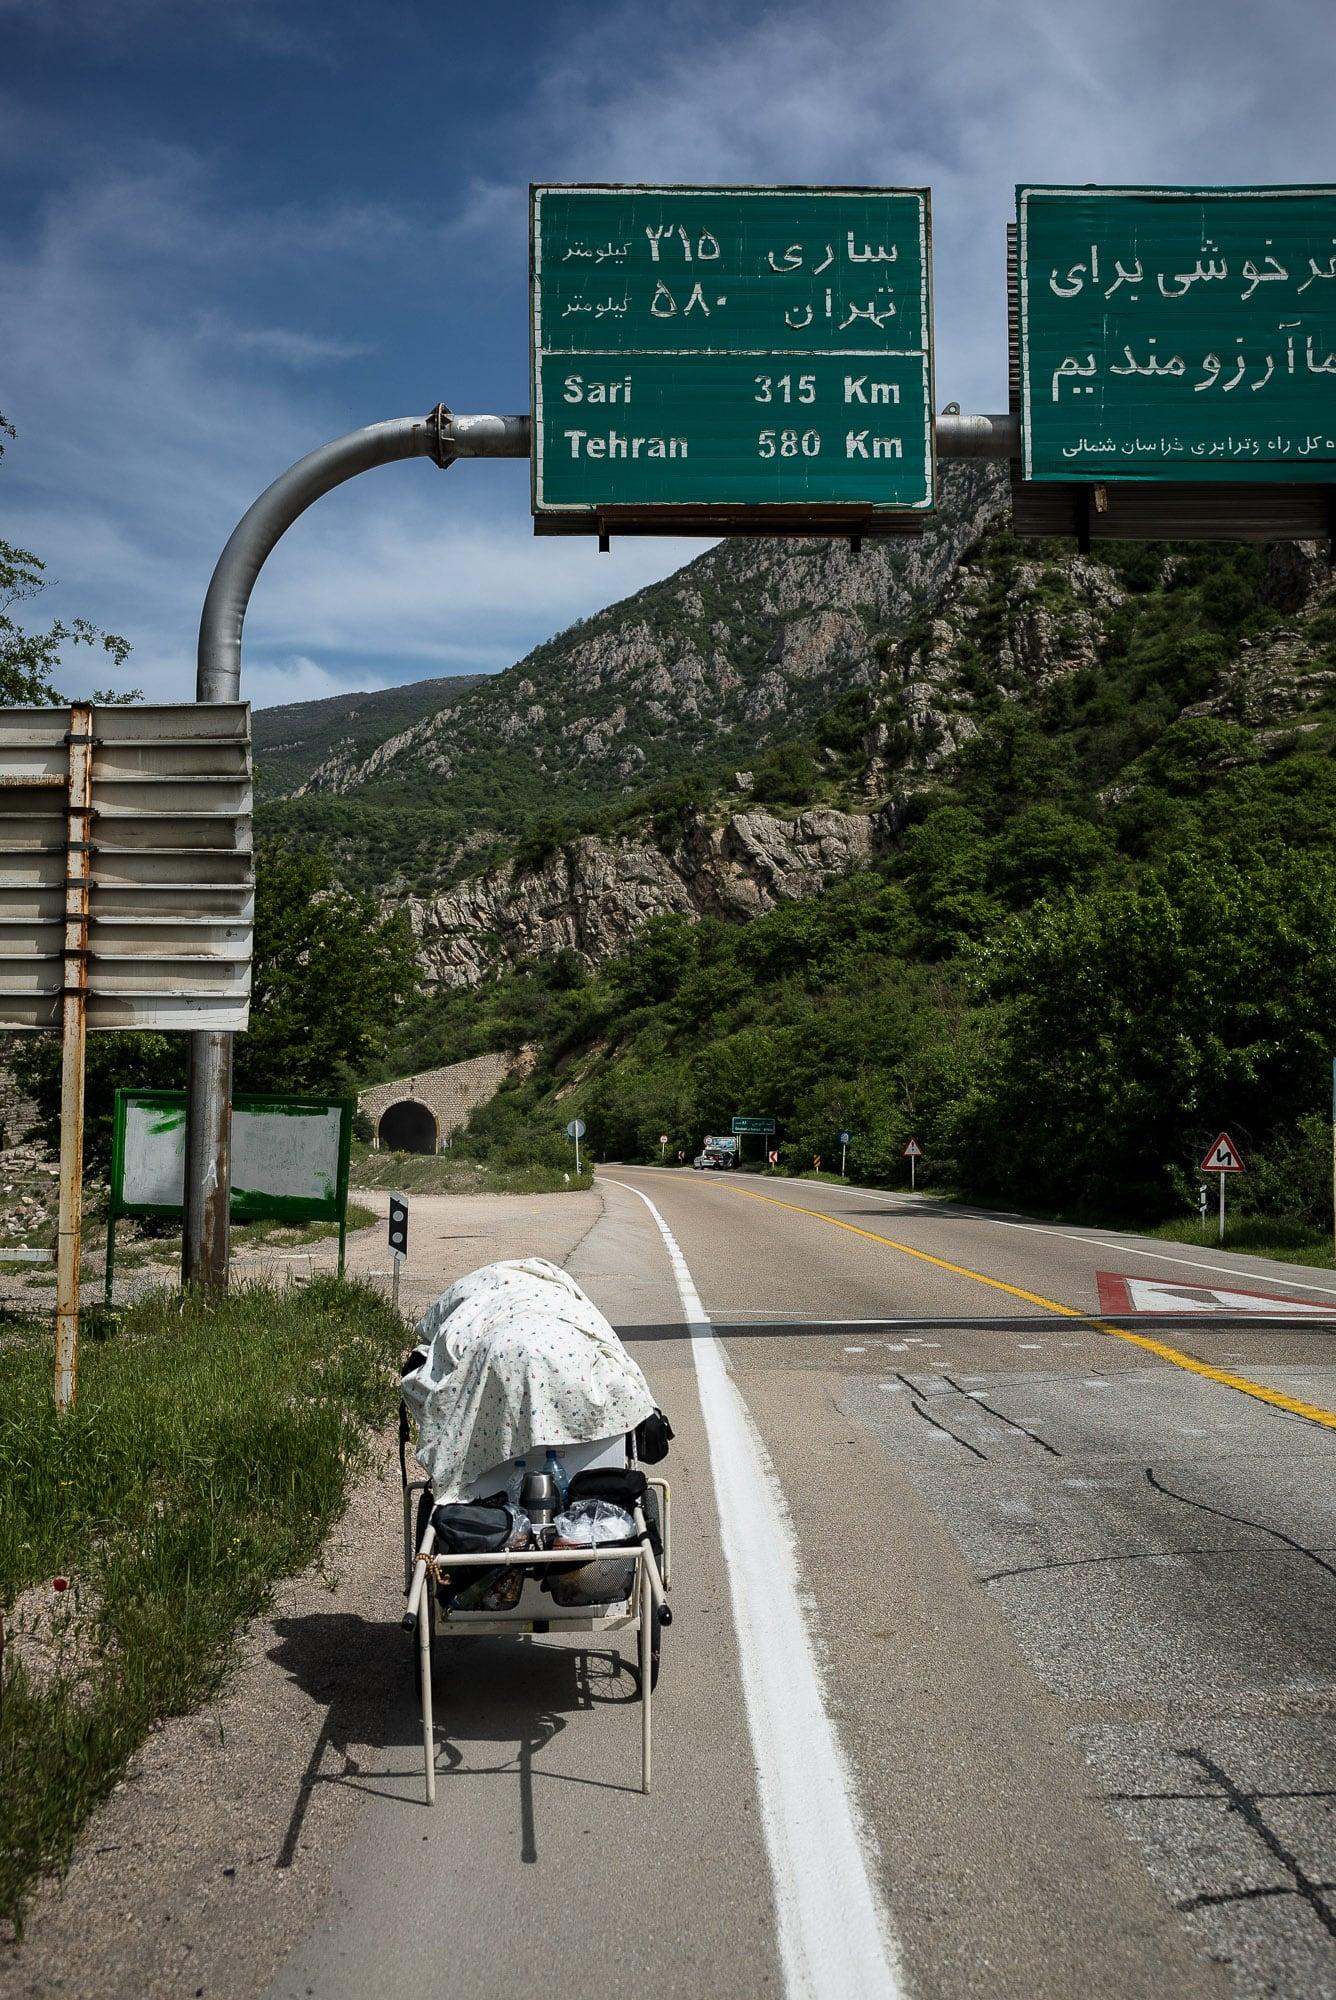 580km to Tehran